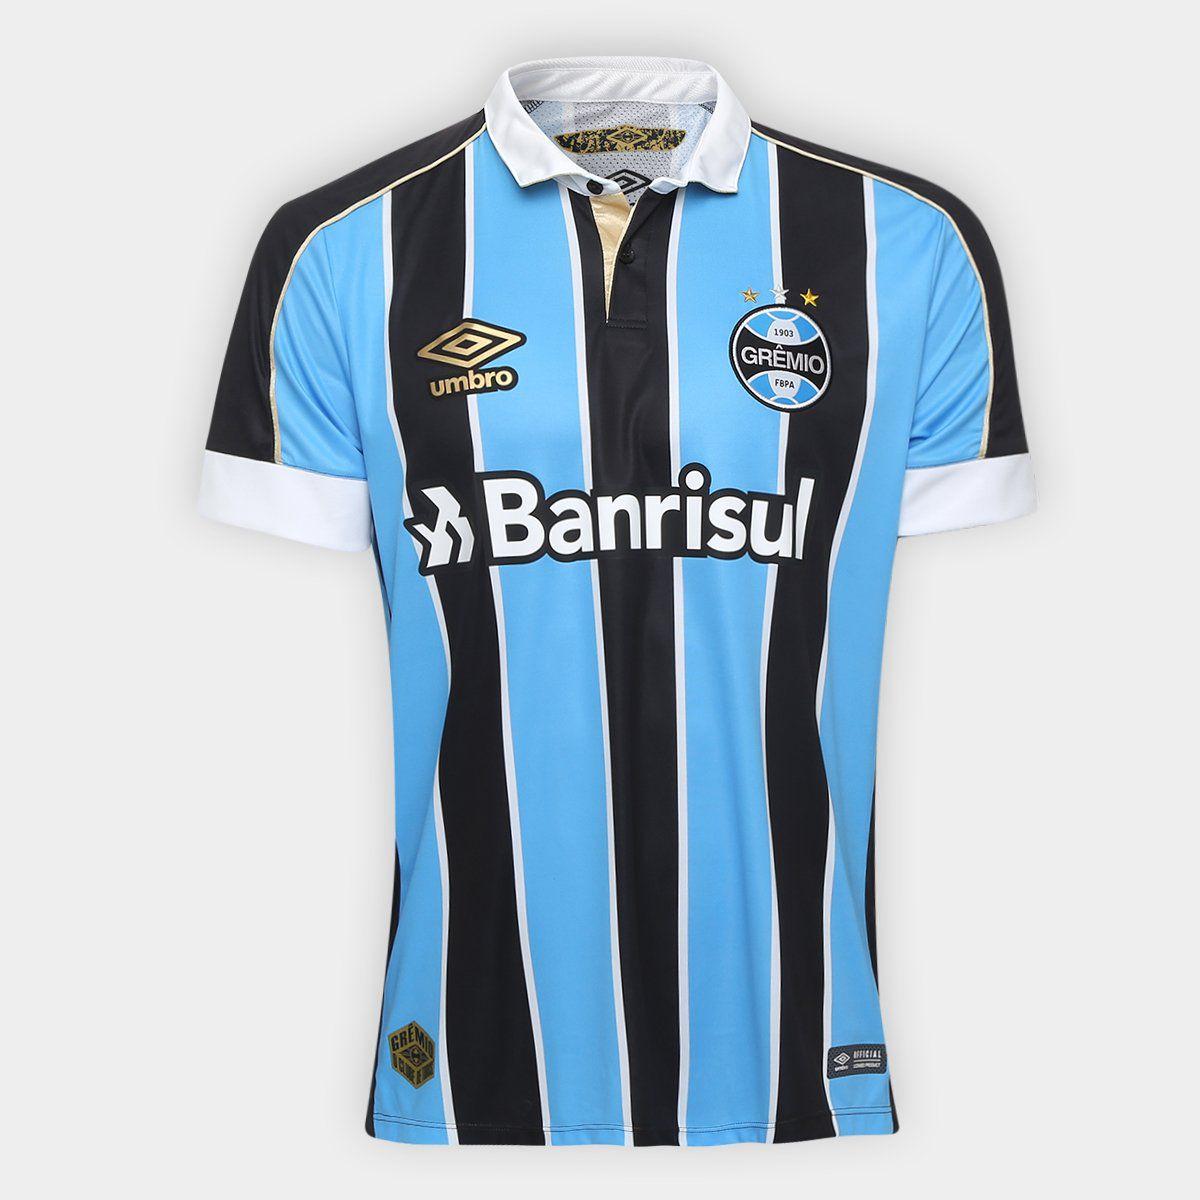 Camisa Grêmio I 1920 snº Torcedor Umbro Masculino